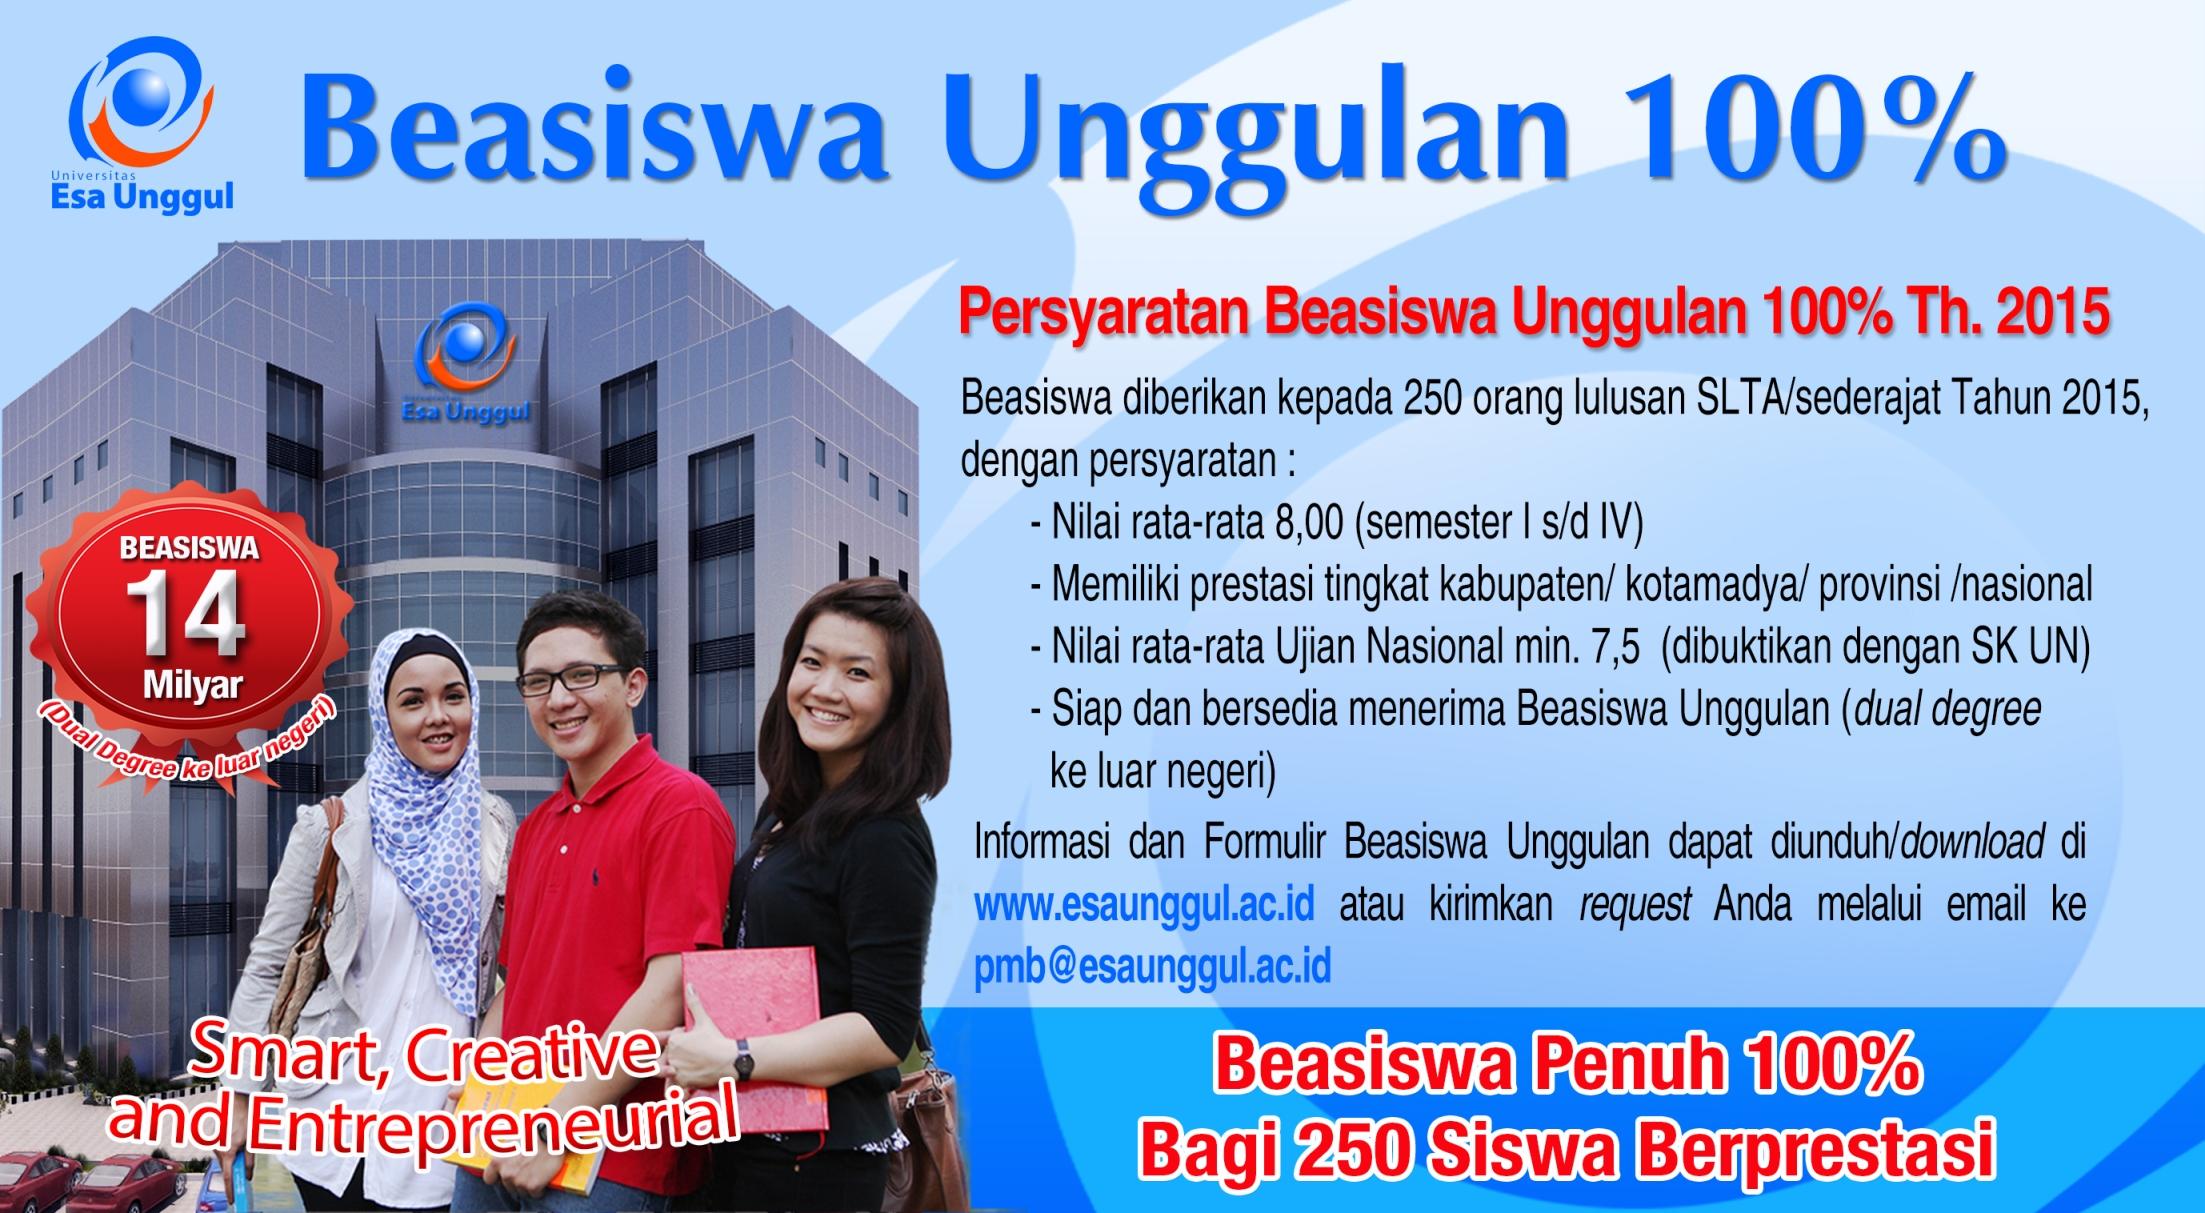 Beasiswa Unggulan 100% – Penerimaan Mahasiswa Baru ...